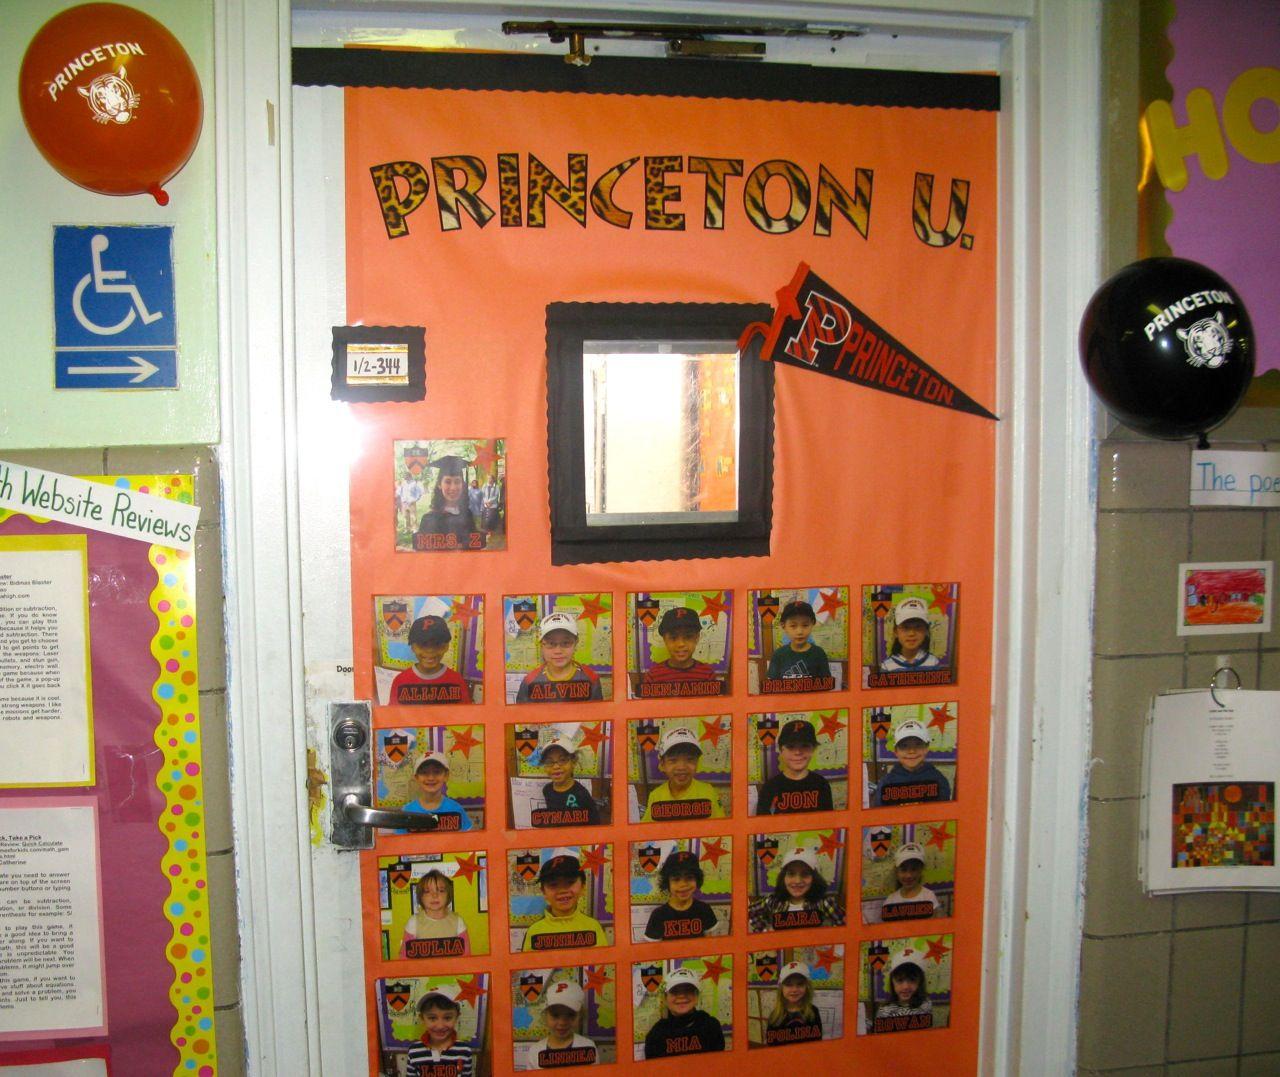 University Of Alabama Classroom Theme College Themed Door Welcomes